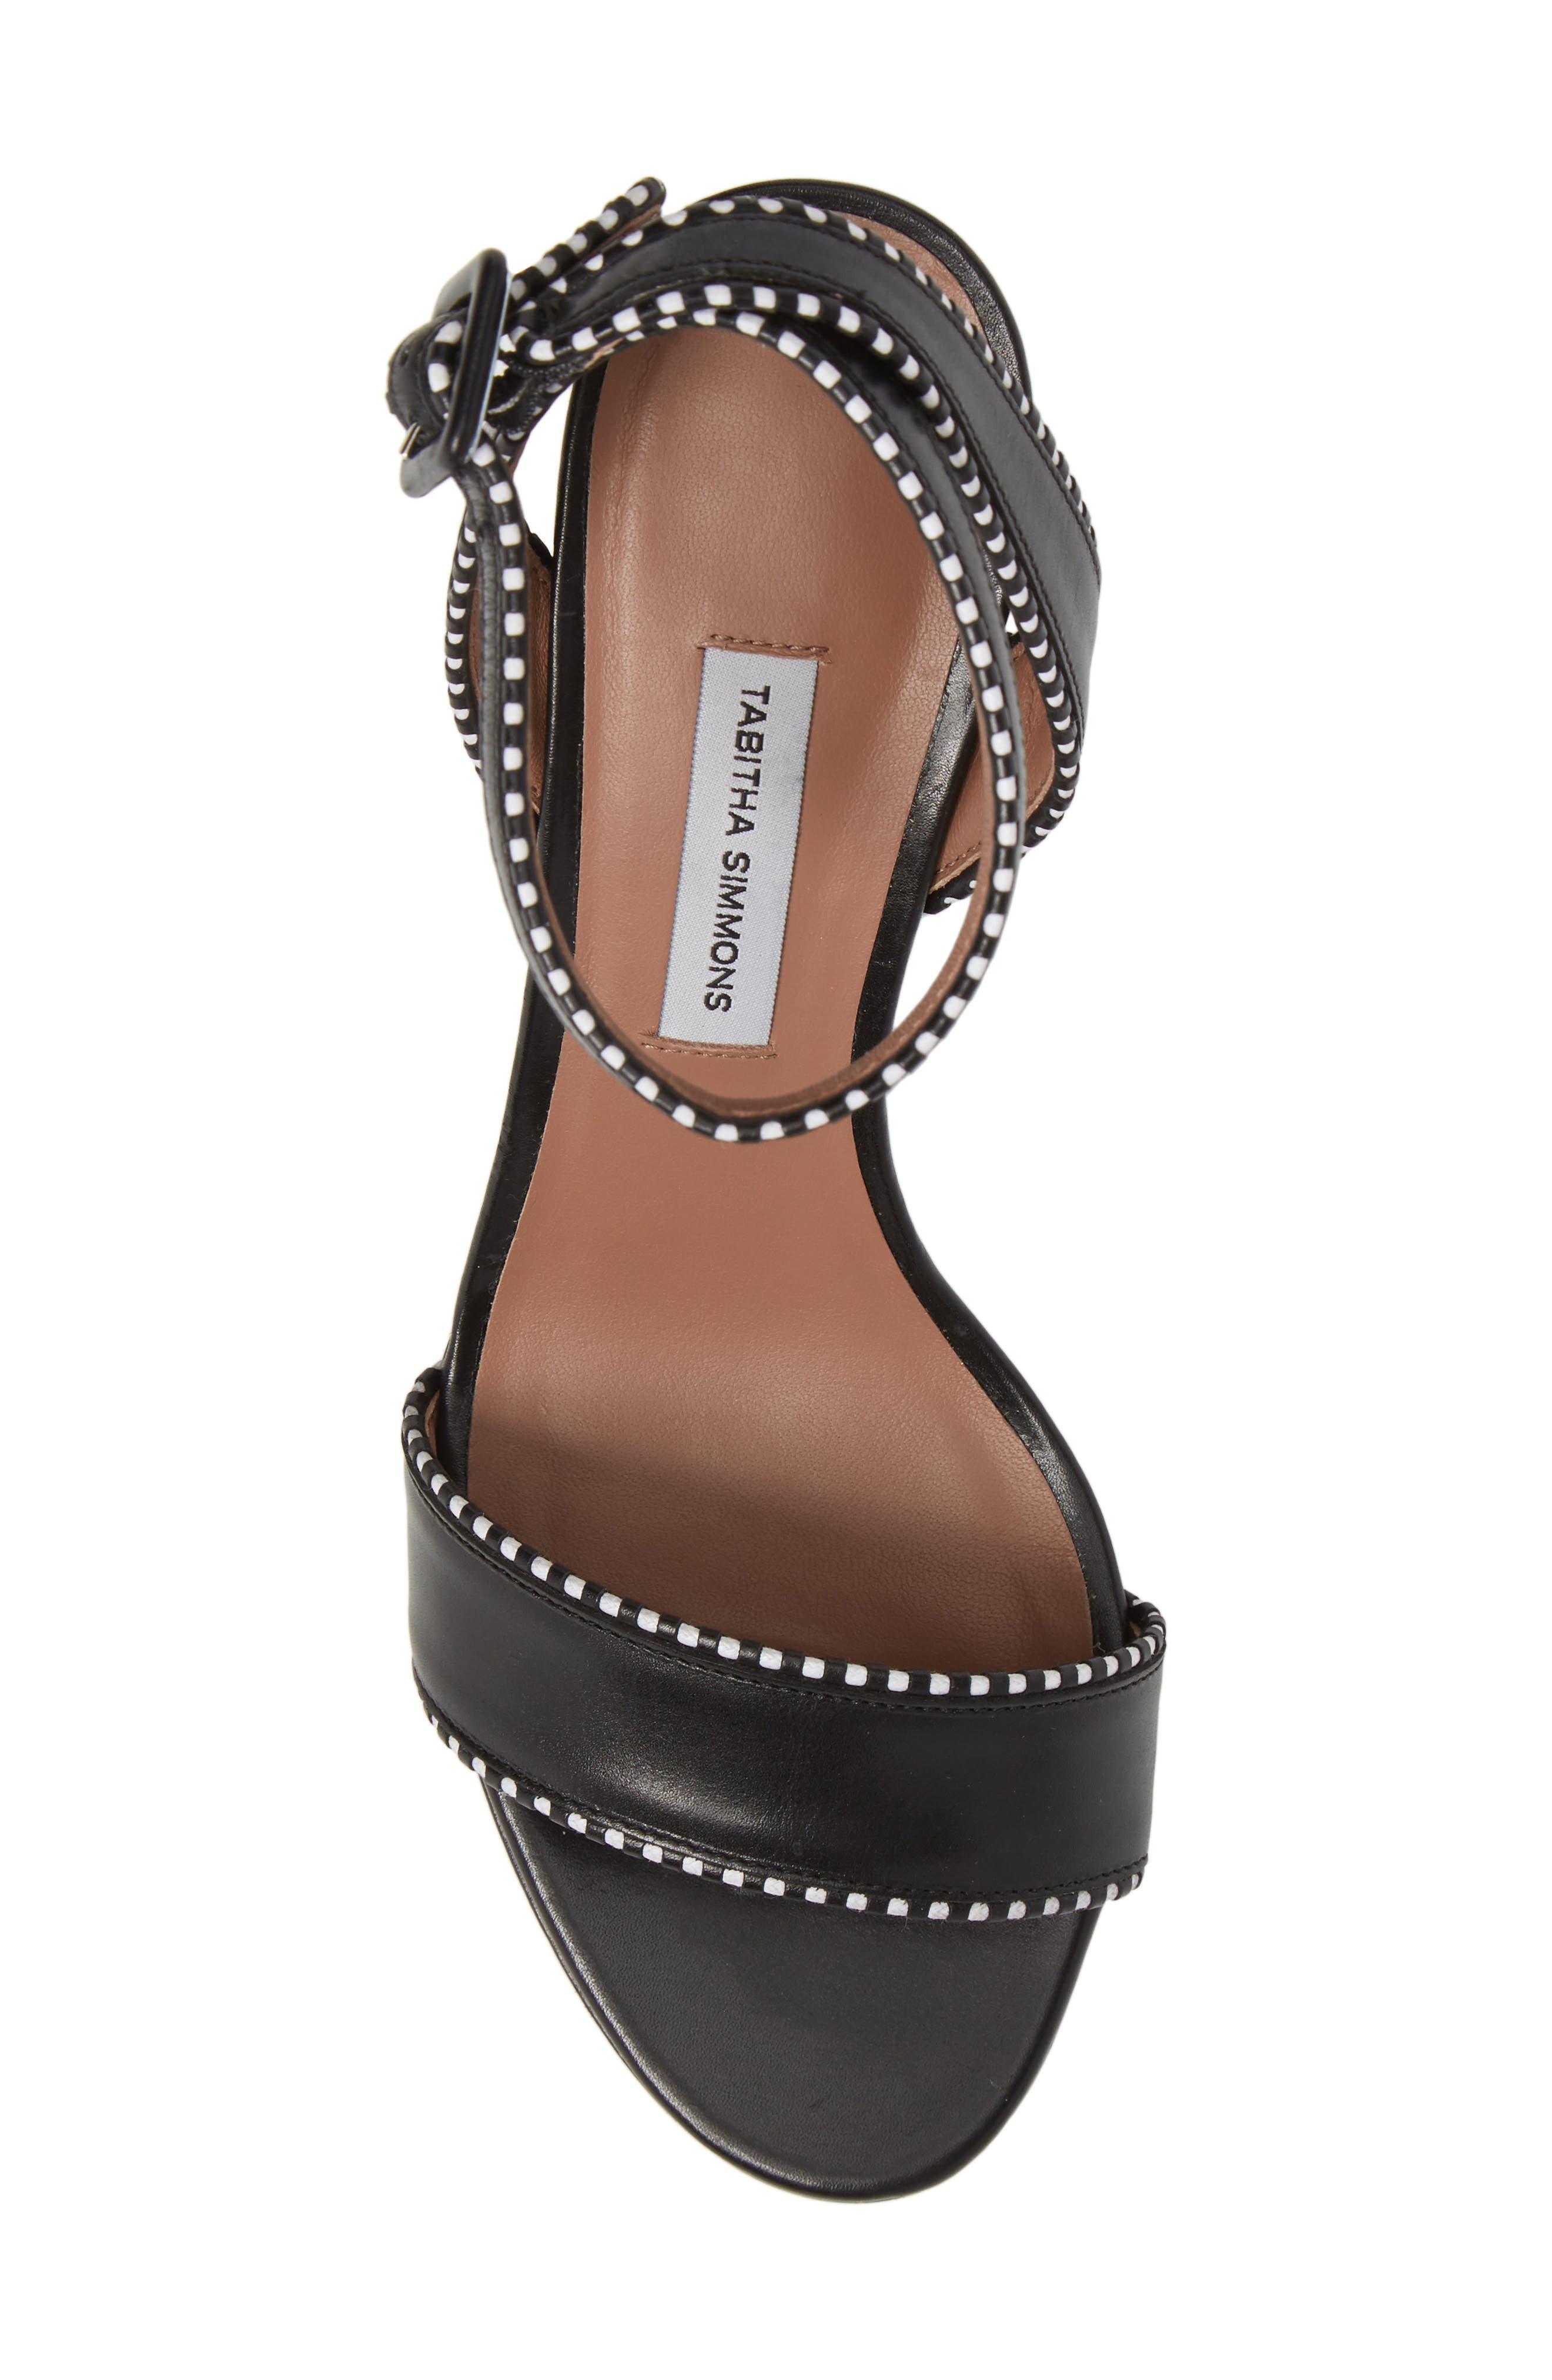 Leticia Profilo Ankle Strap Sandal,                             Alternate thumbnail 5, color,                             Black